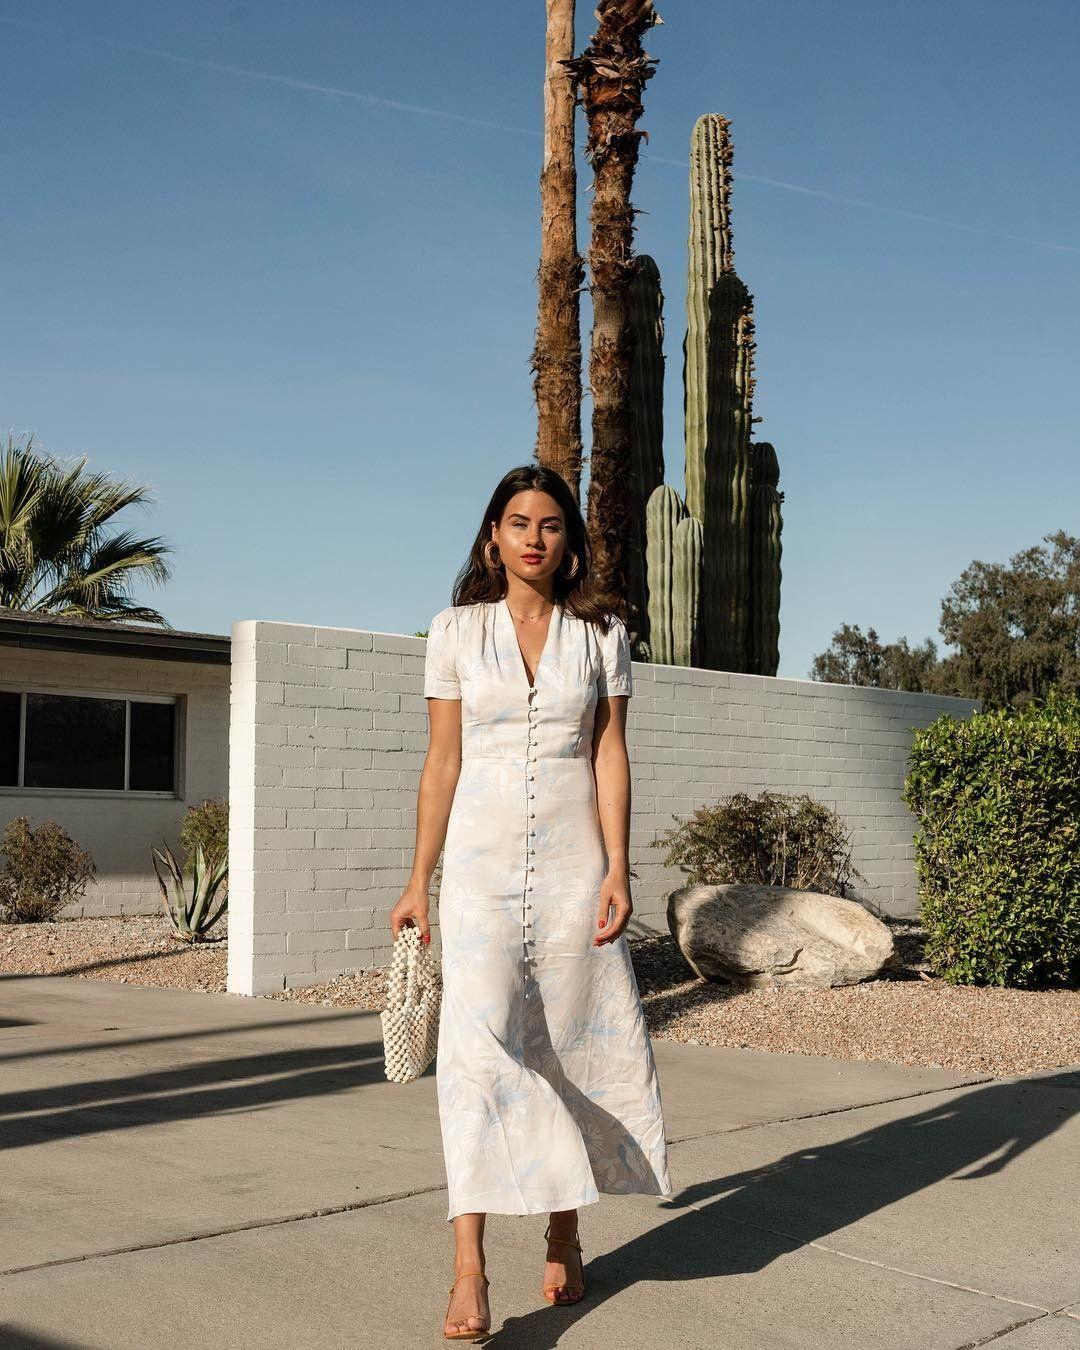 64e91fee8fec9 Gaetan dress in 2019 | | STREET STYLE | | Dresses, Fashion, Style